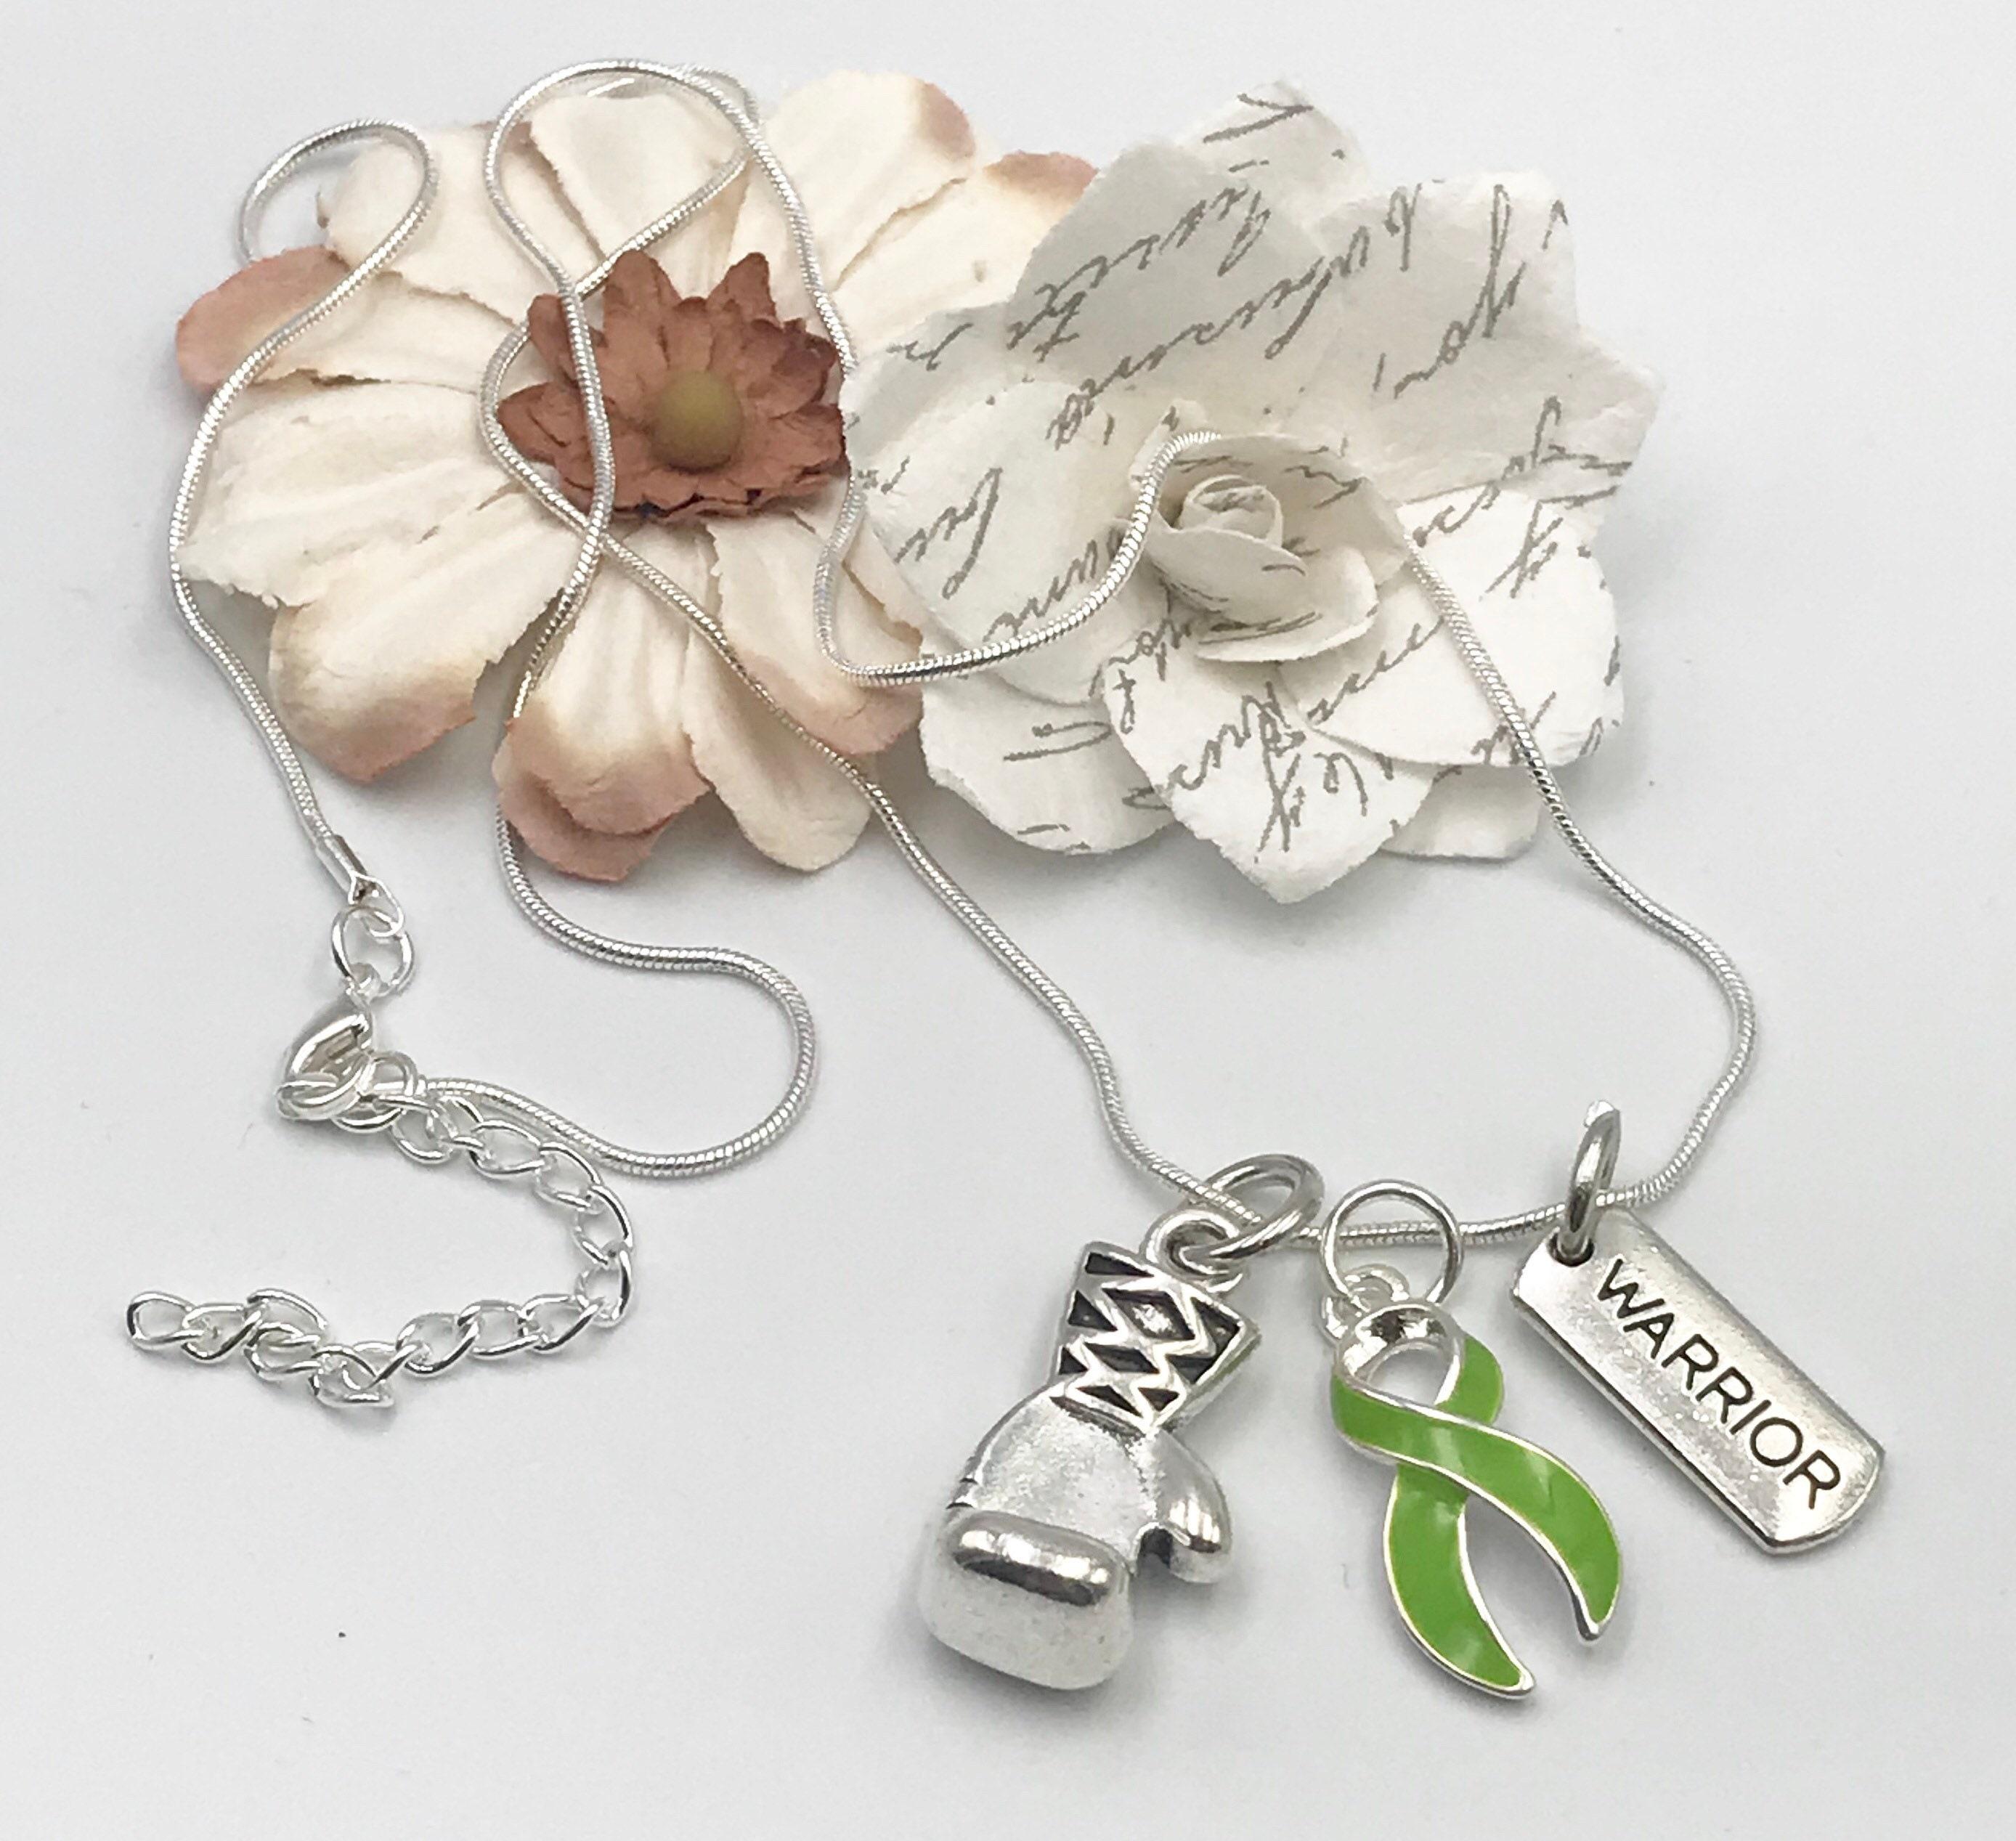 Custom Lymphoma Awareness Hodgkins Ribbon Silver Necklace Jewelry Choose Initial